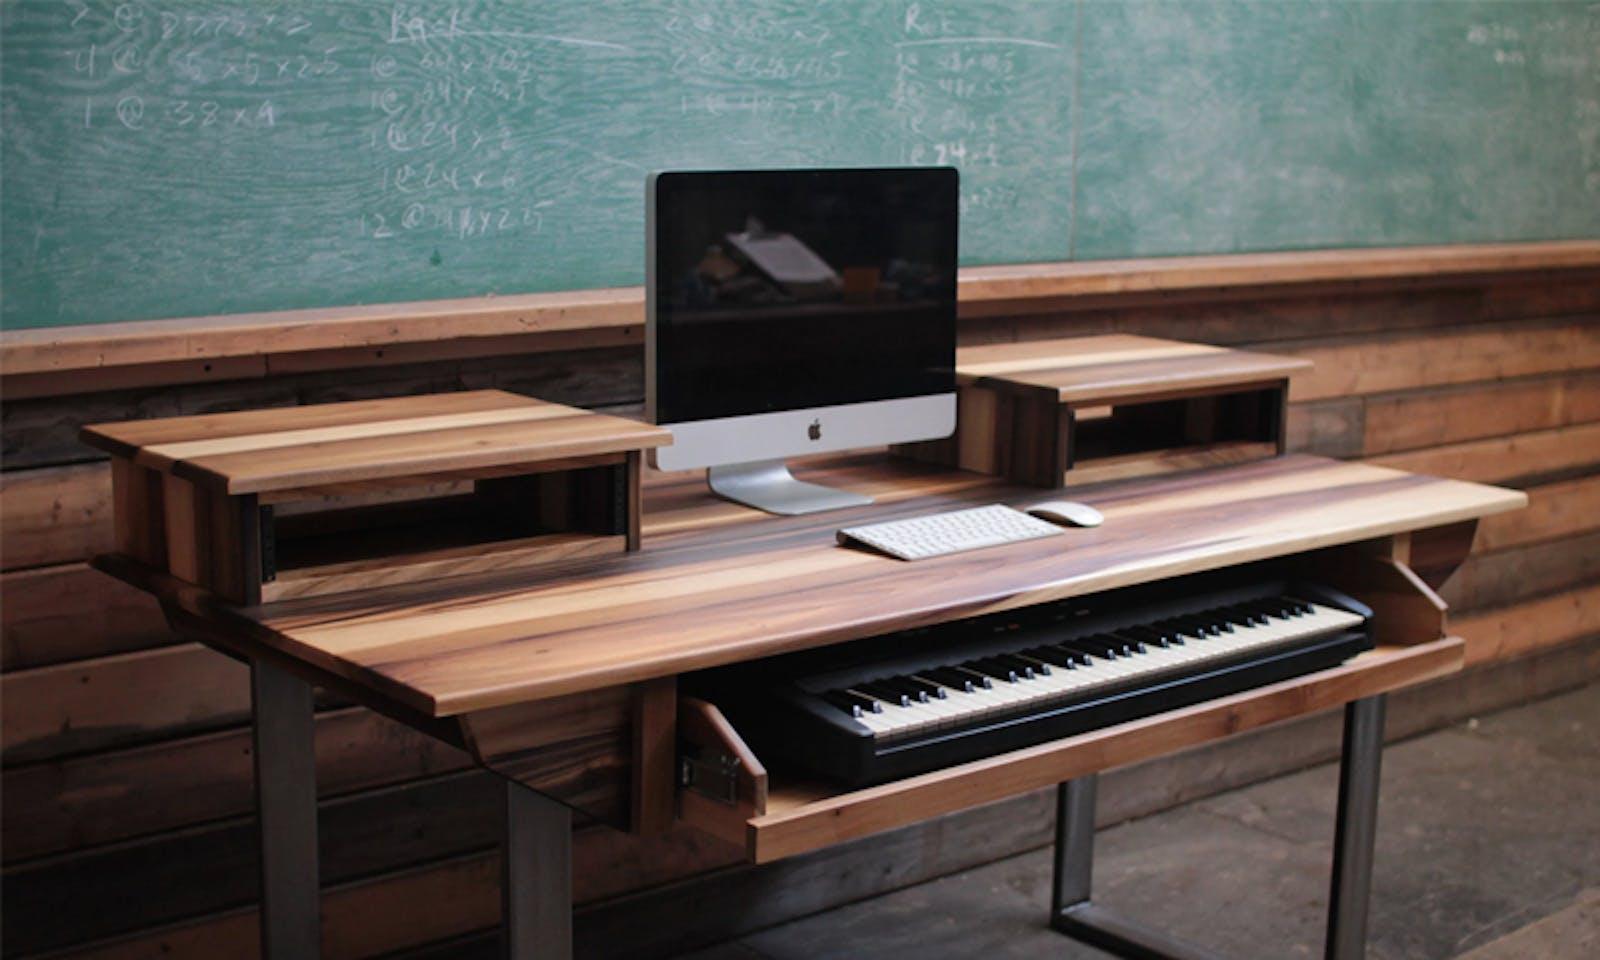 Monkwood music studio desk